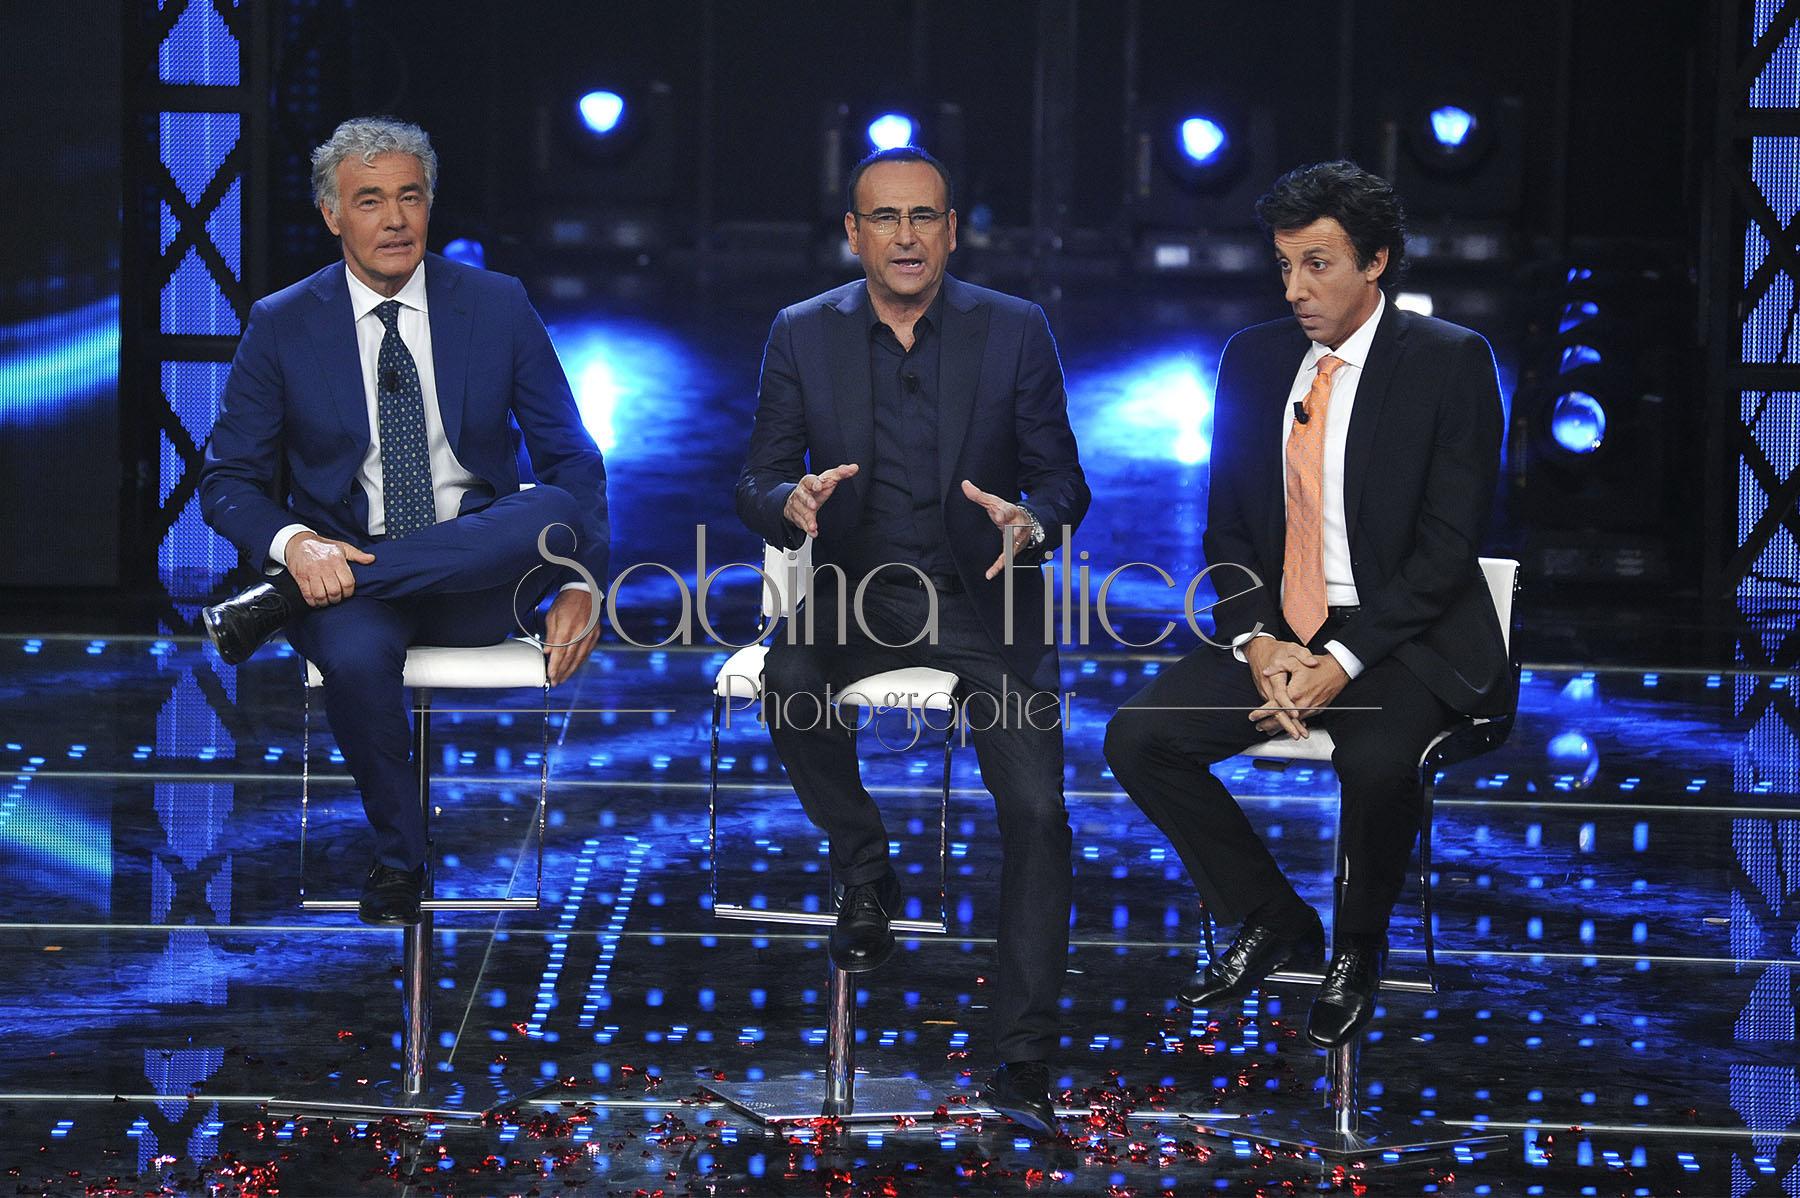 I Migliori Anni: M.Giletti-C.Conti-U.Pantani